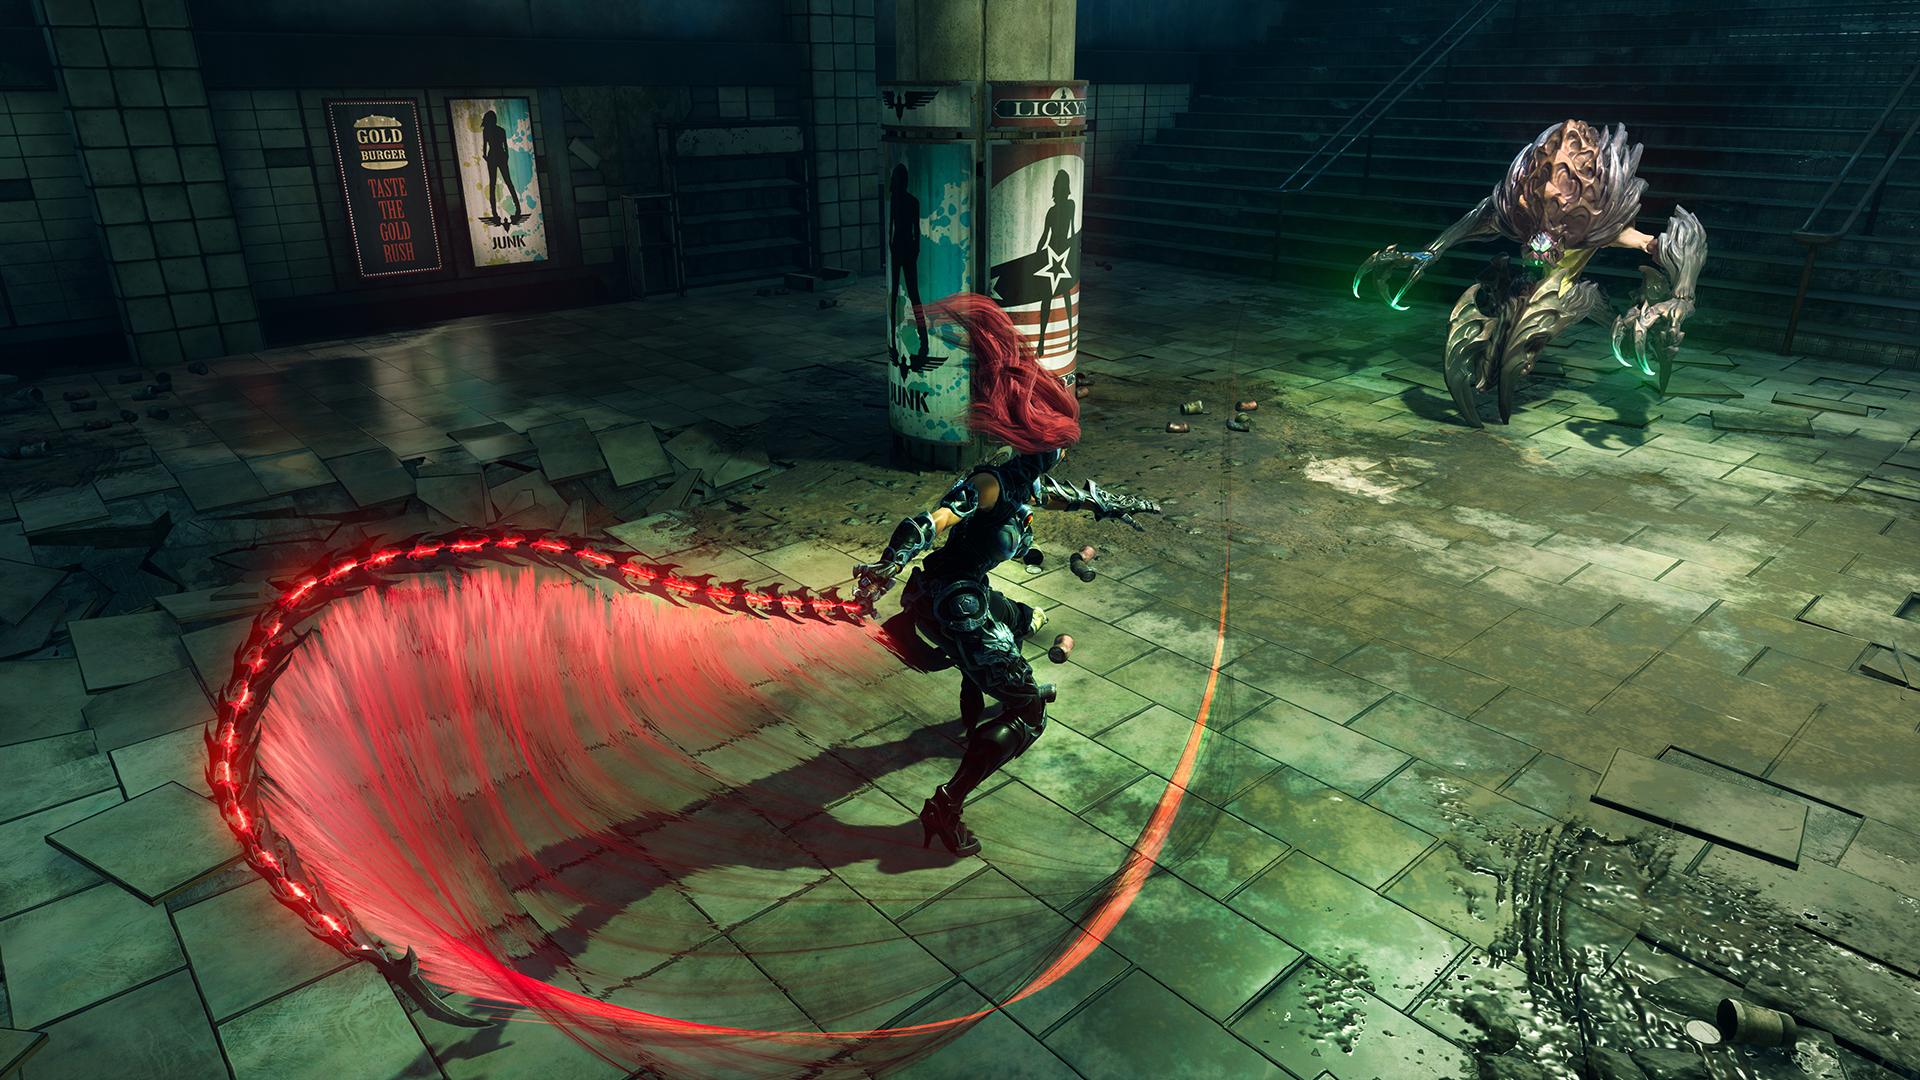 Скриншот Darksiders III: Deluxe Edition (2018) PC